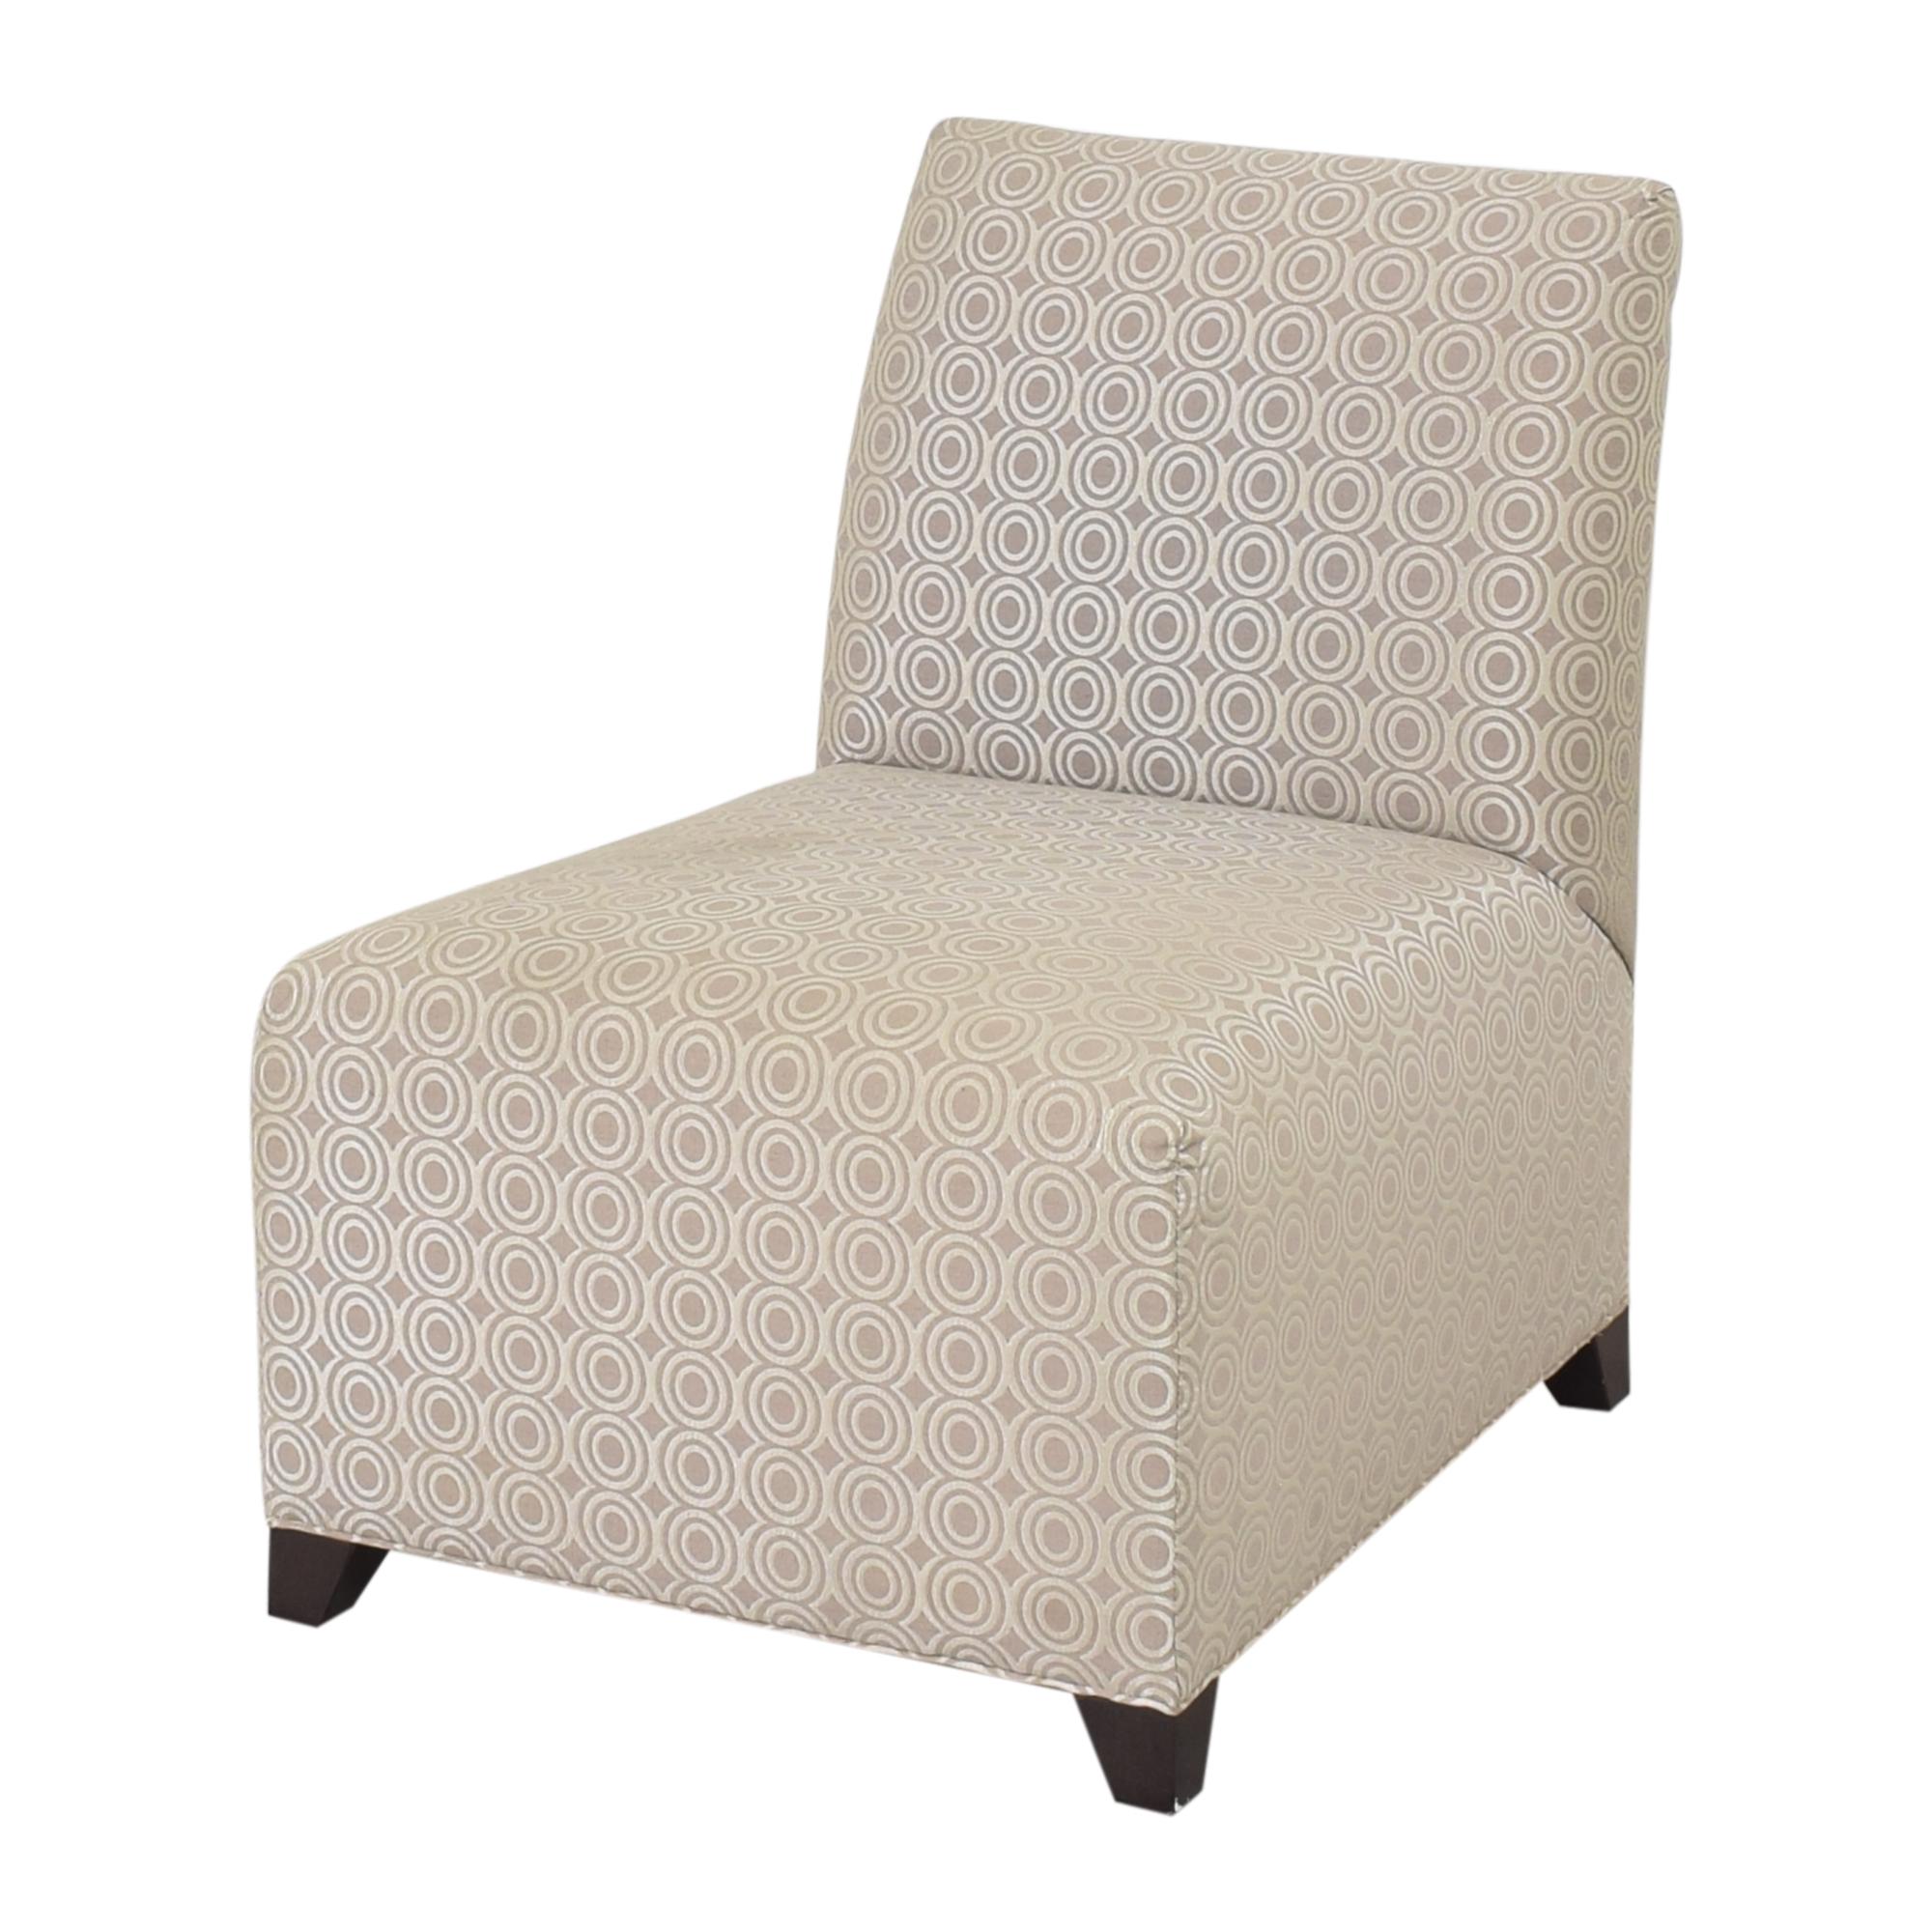 shop Ethan Allen Slipper Accent Chair with Ottoman Ethan Allen Chairs